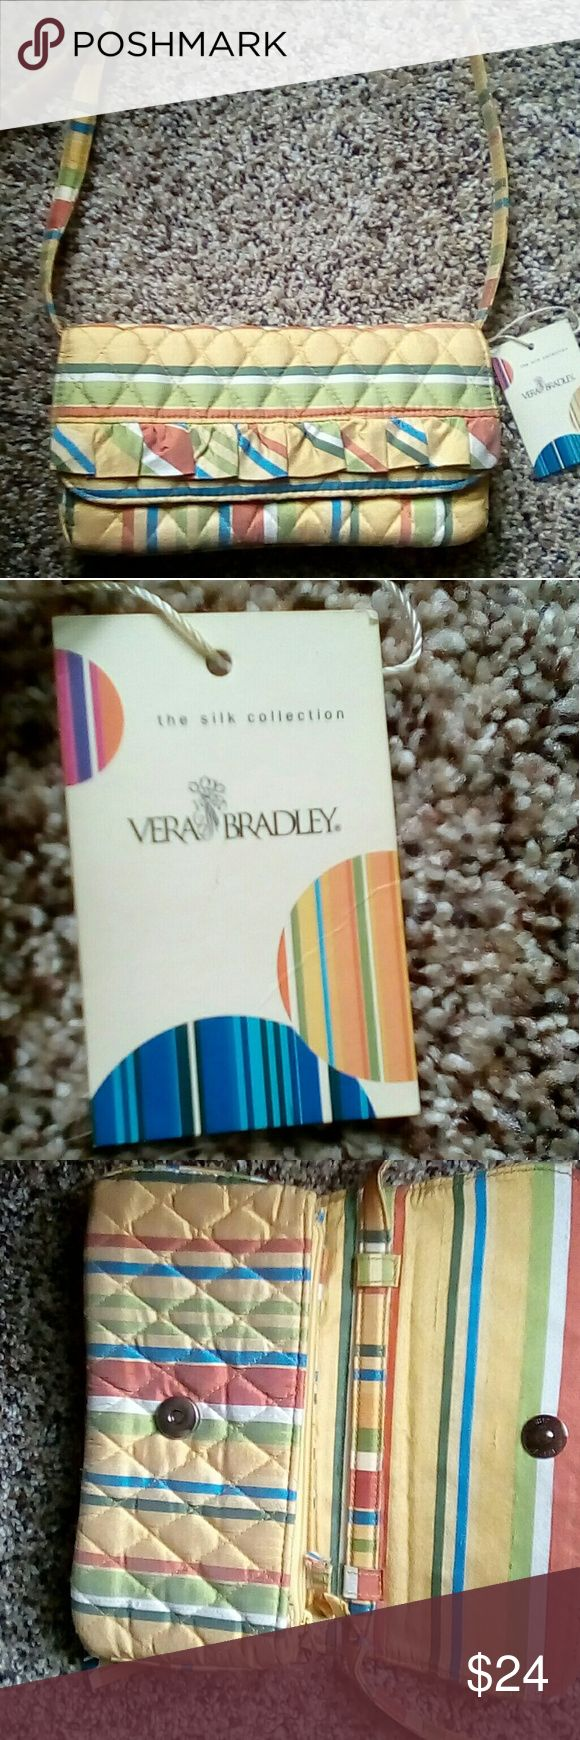 Vera Bradley Clutch Vintage Satin Multi Color Clutch by Very Bradley Vera Bradley Bags Clutches & Wristlets